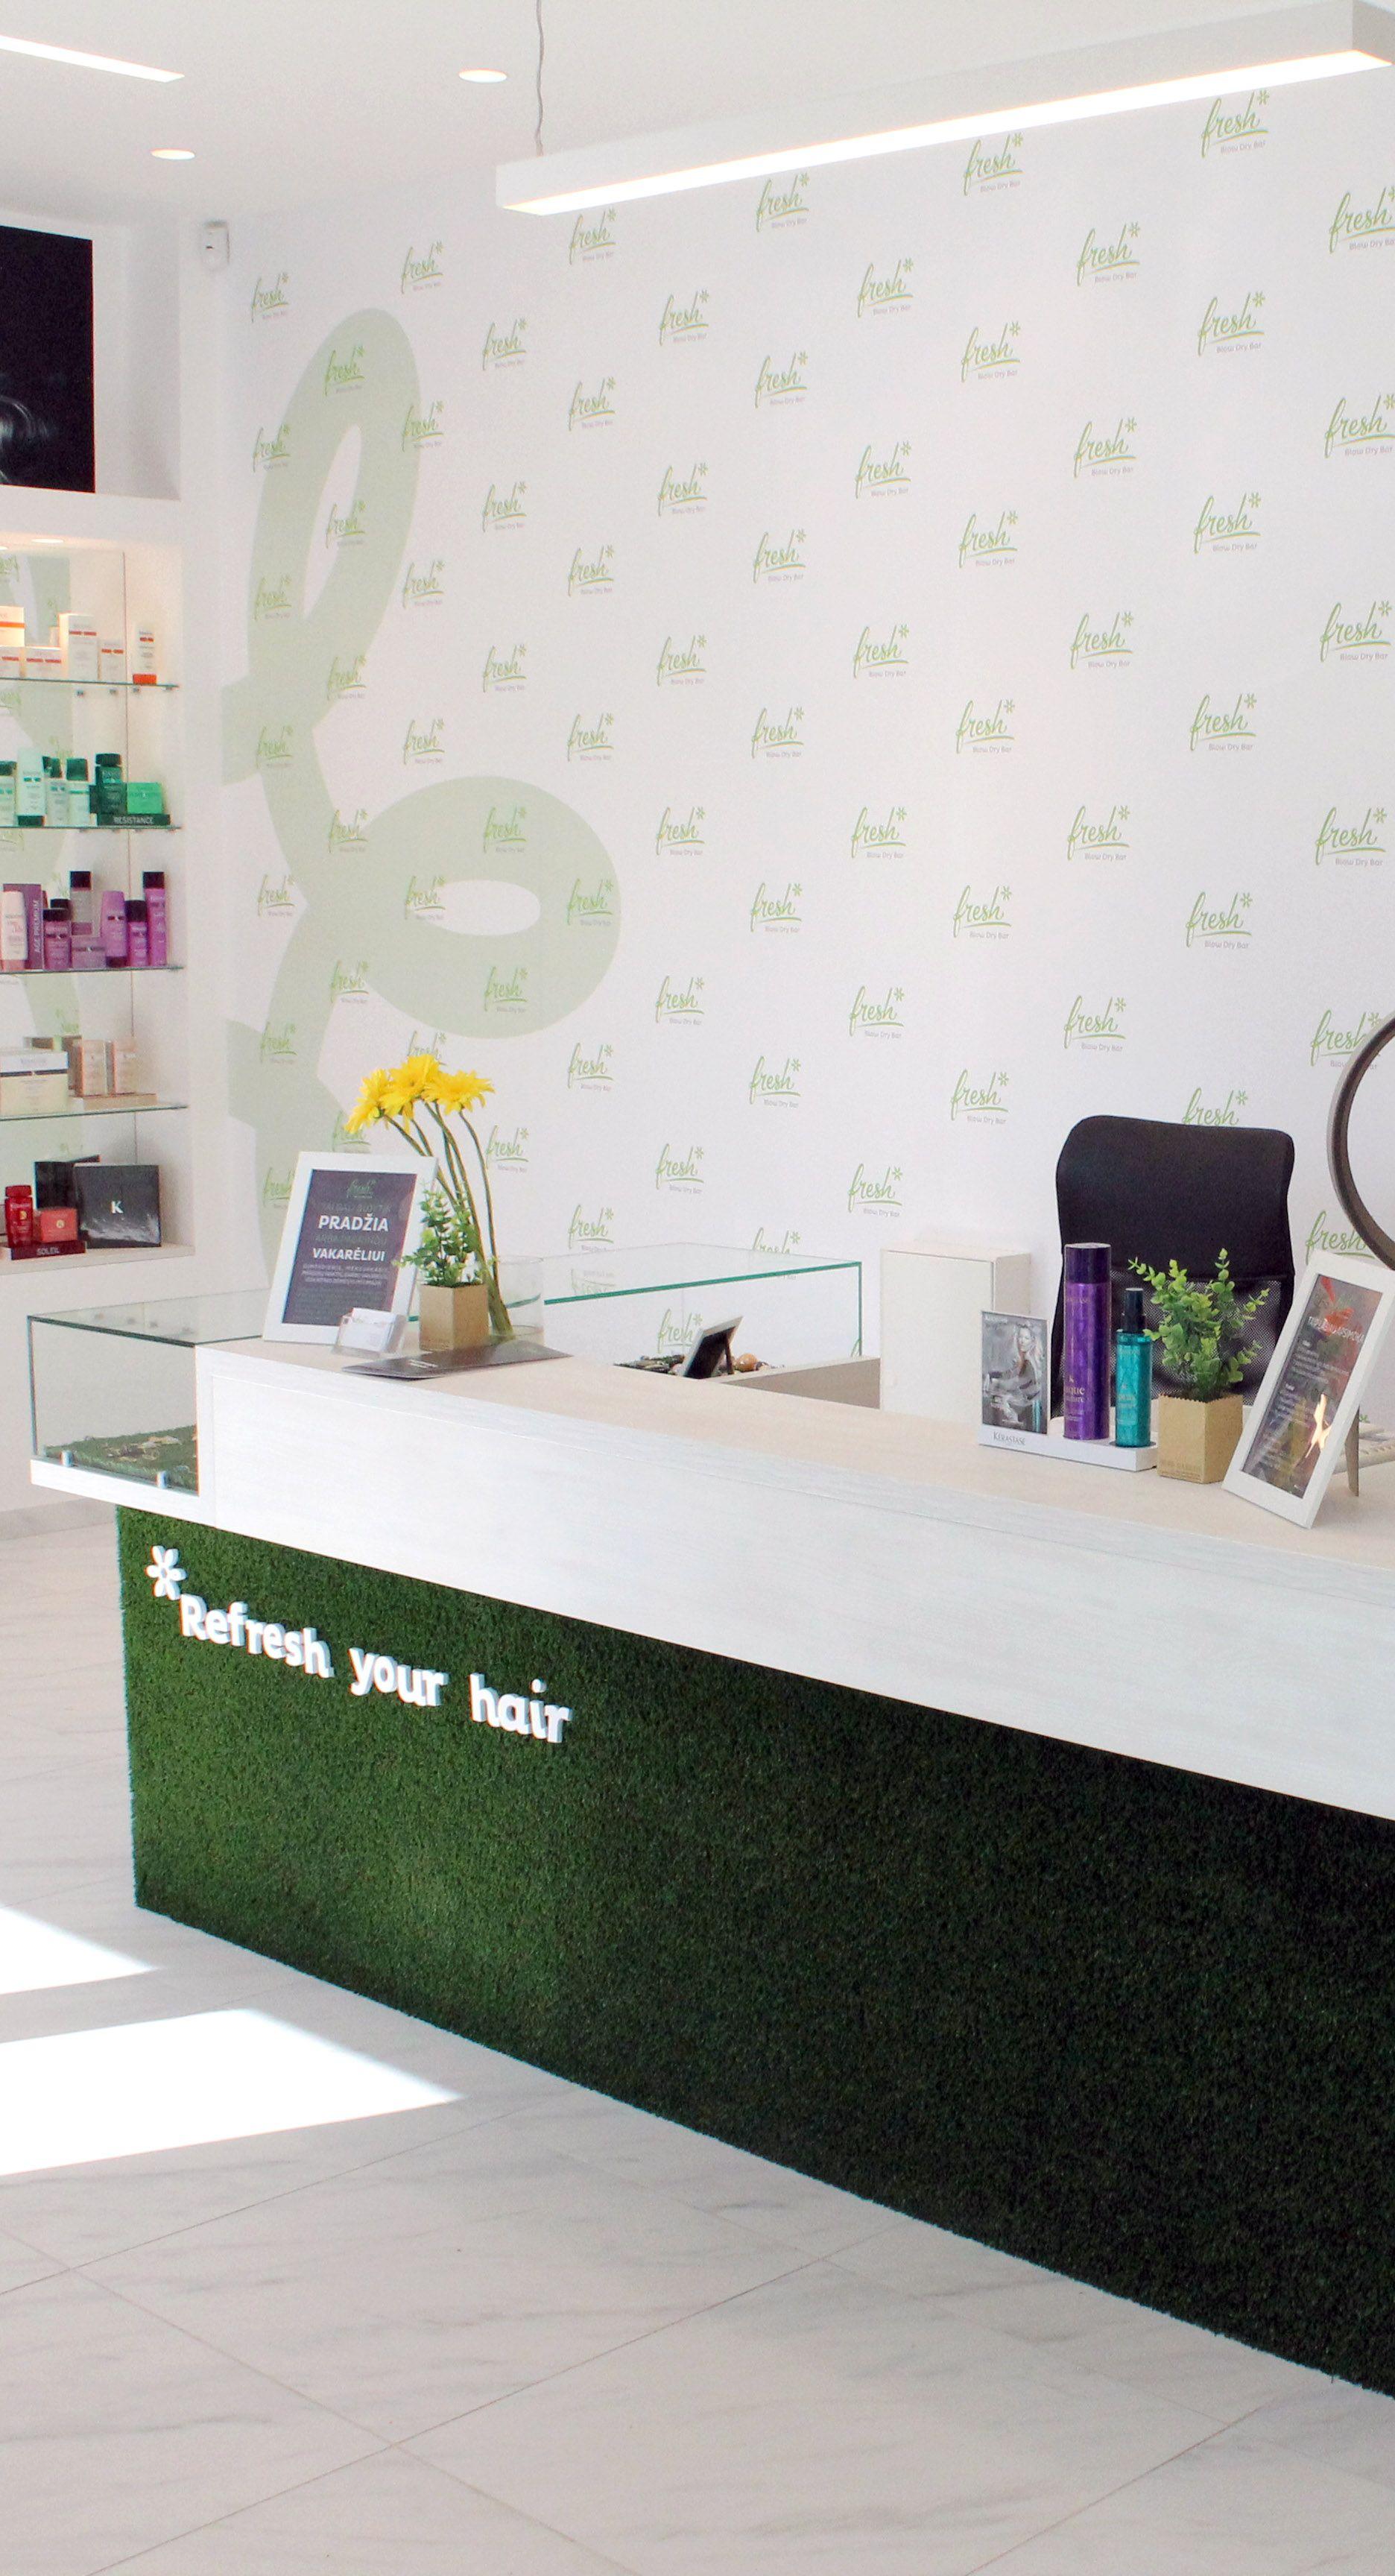 foto wall Dry bar, Home decor, Beauty bar